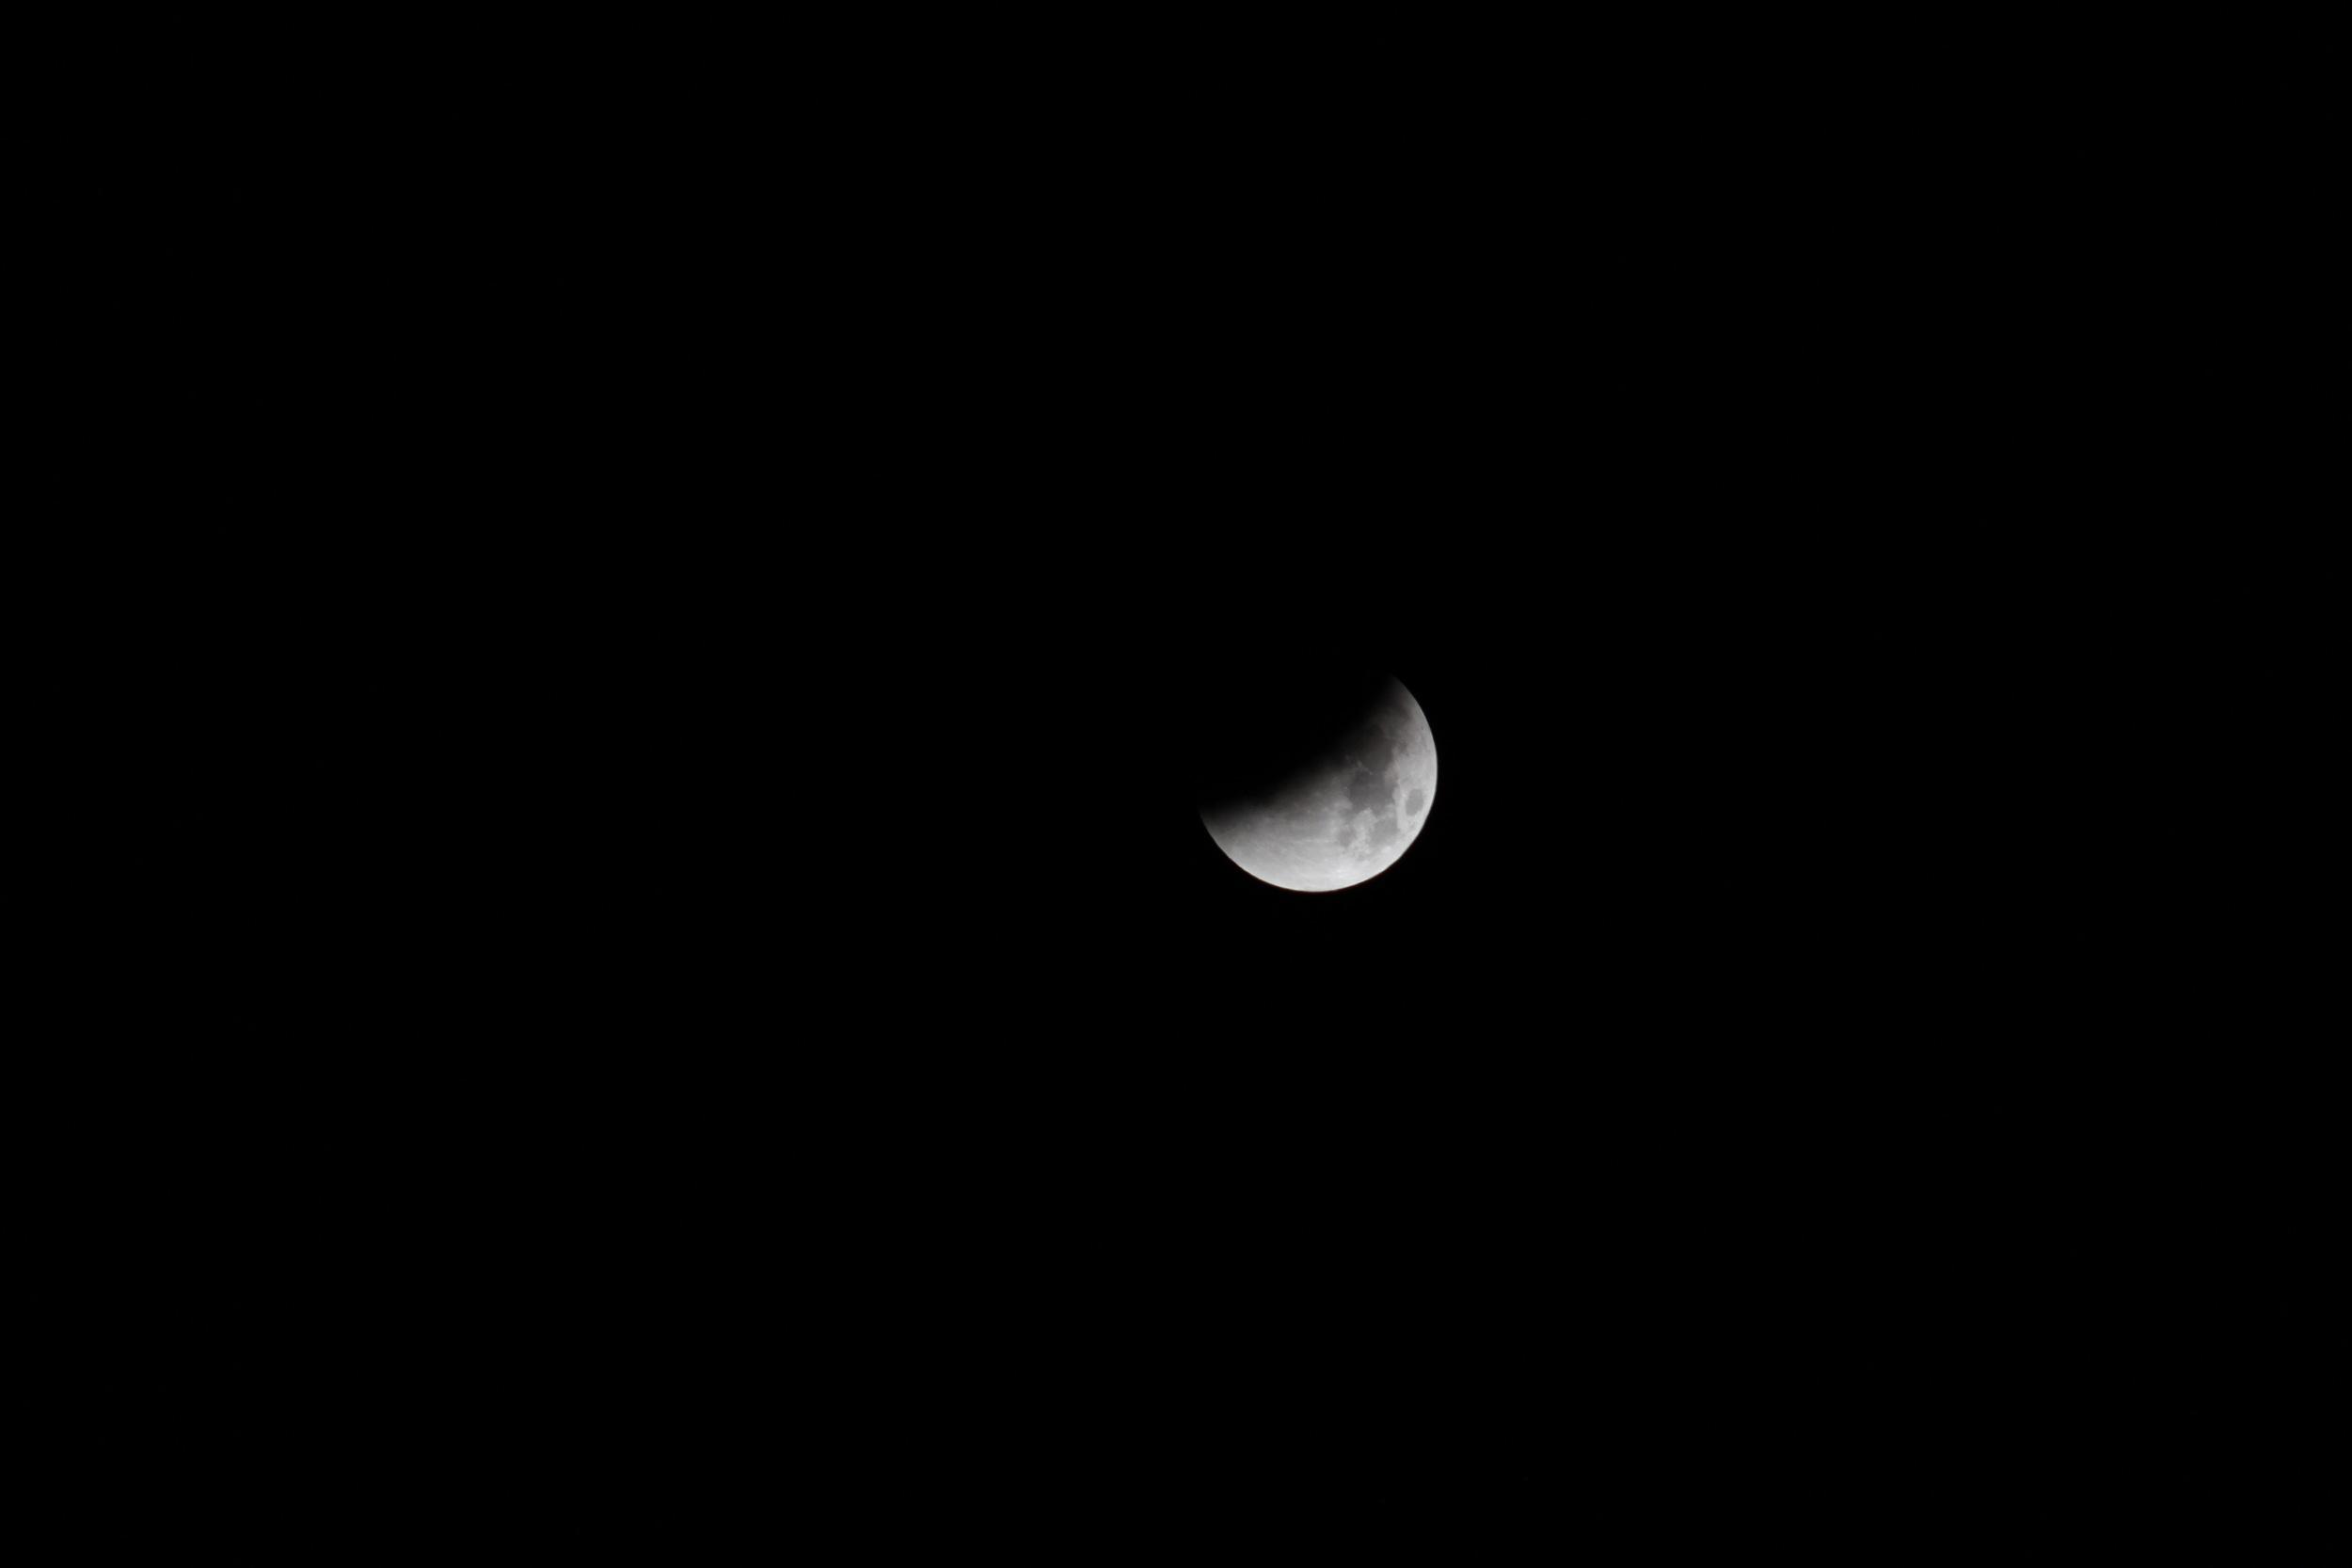 supermoon eclipse emma leafe 2015_1.5.jpg